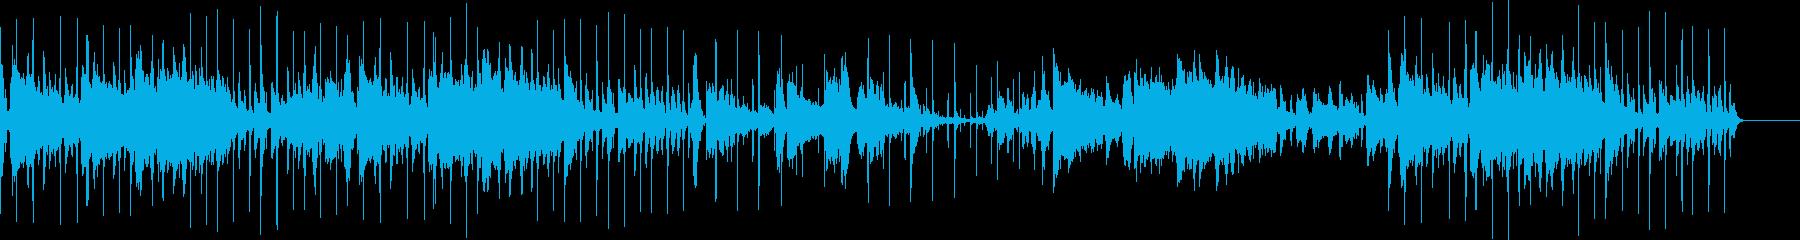 Bossa Nova pop の再生済みの波形